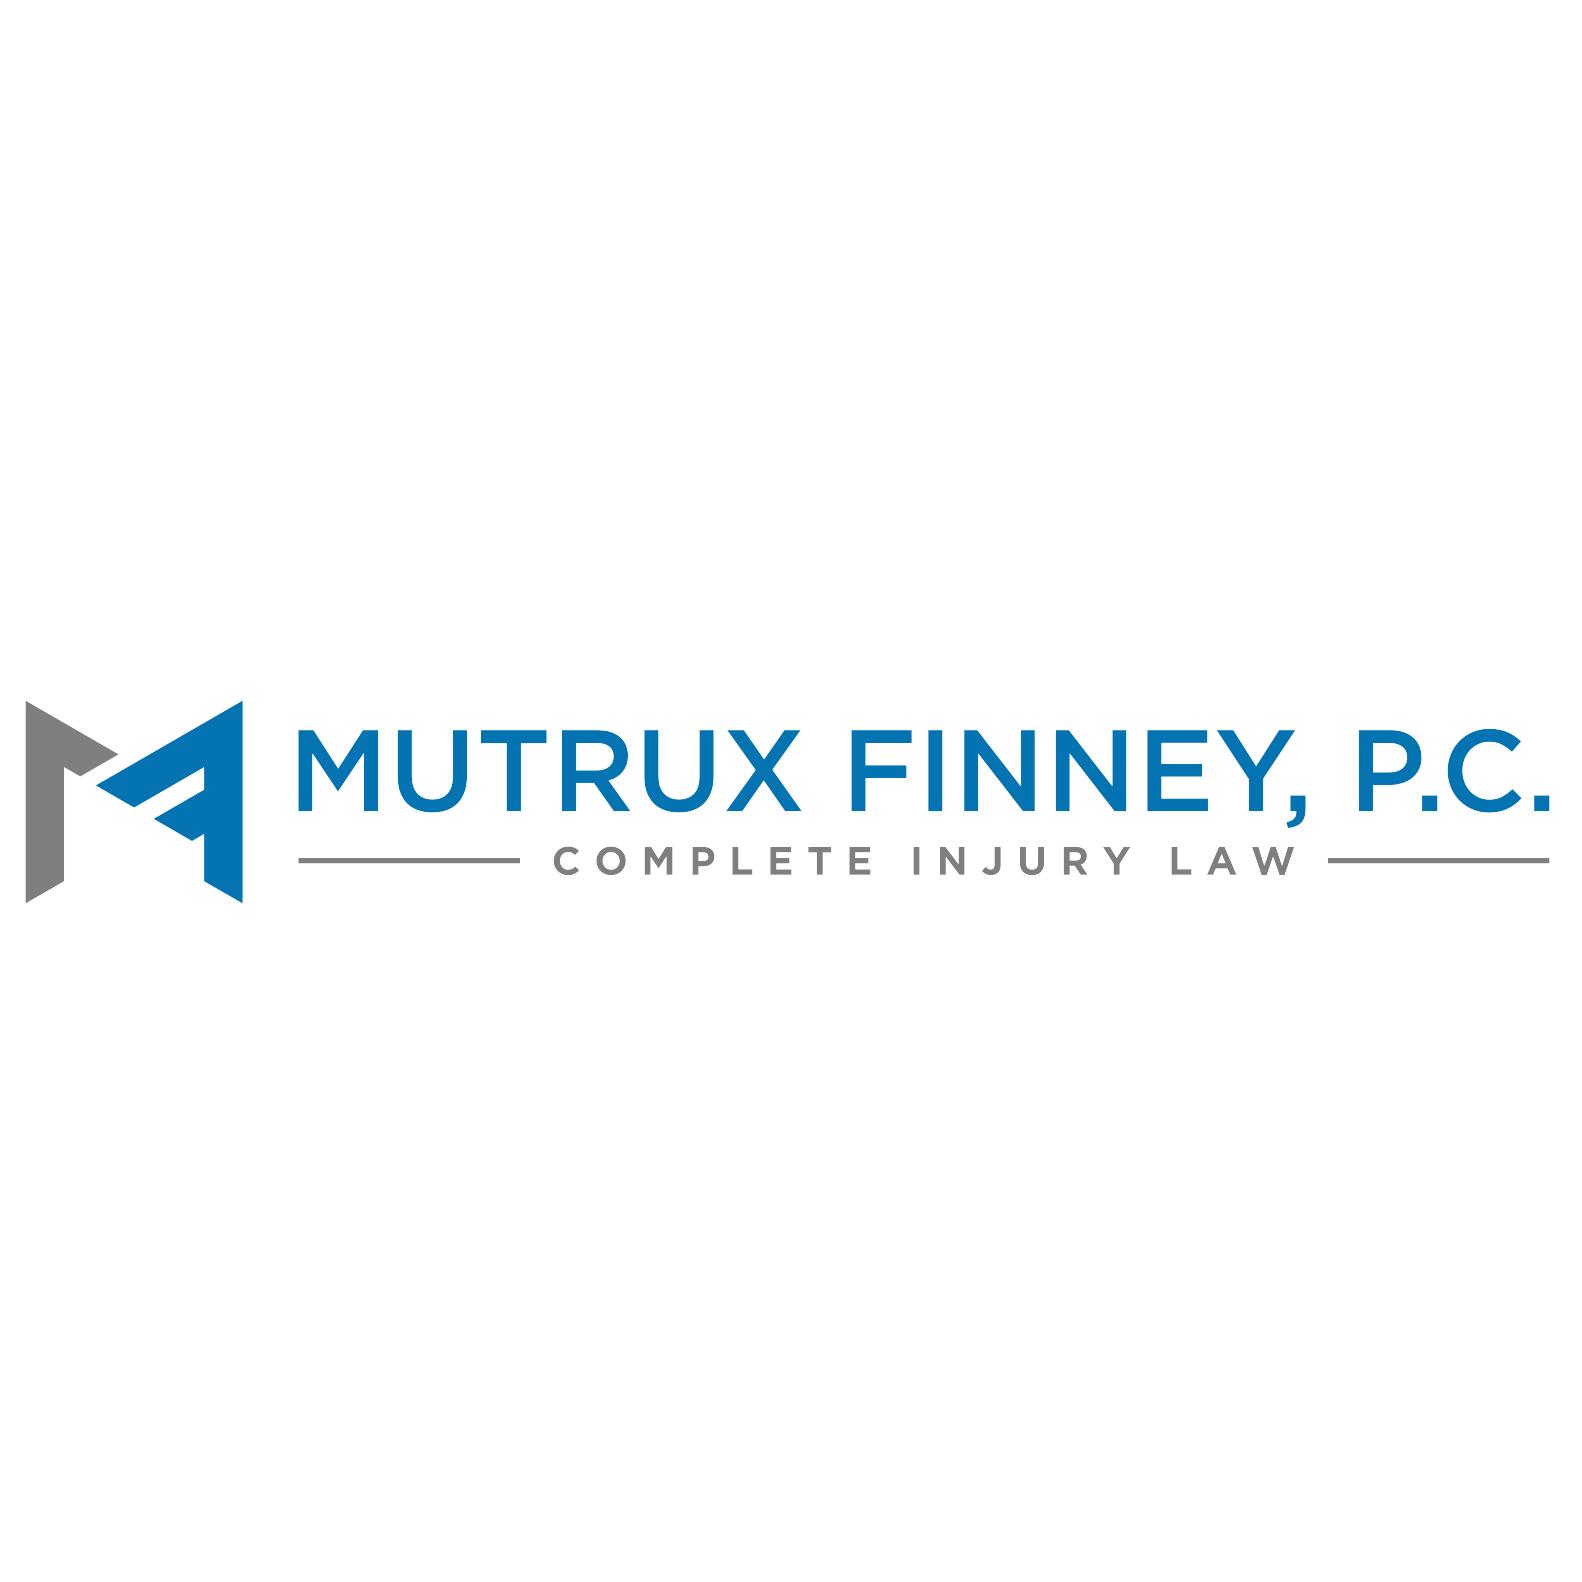 Personal Injury Attorney in MO St. Louis 63105 Mutrux Finney, P.C. - Clayton 225 S Meramec Avenue Suite 821T (314)200-2687